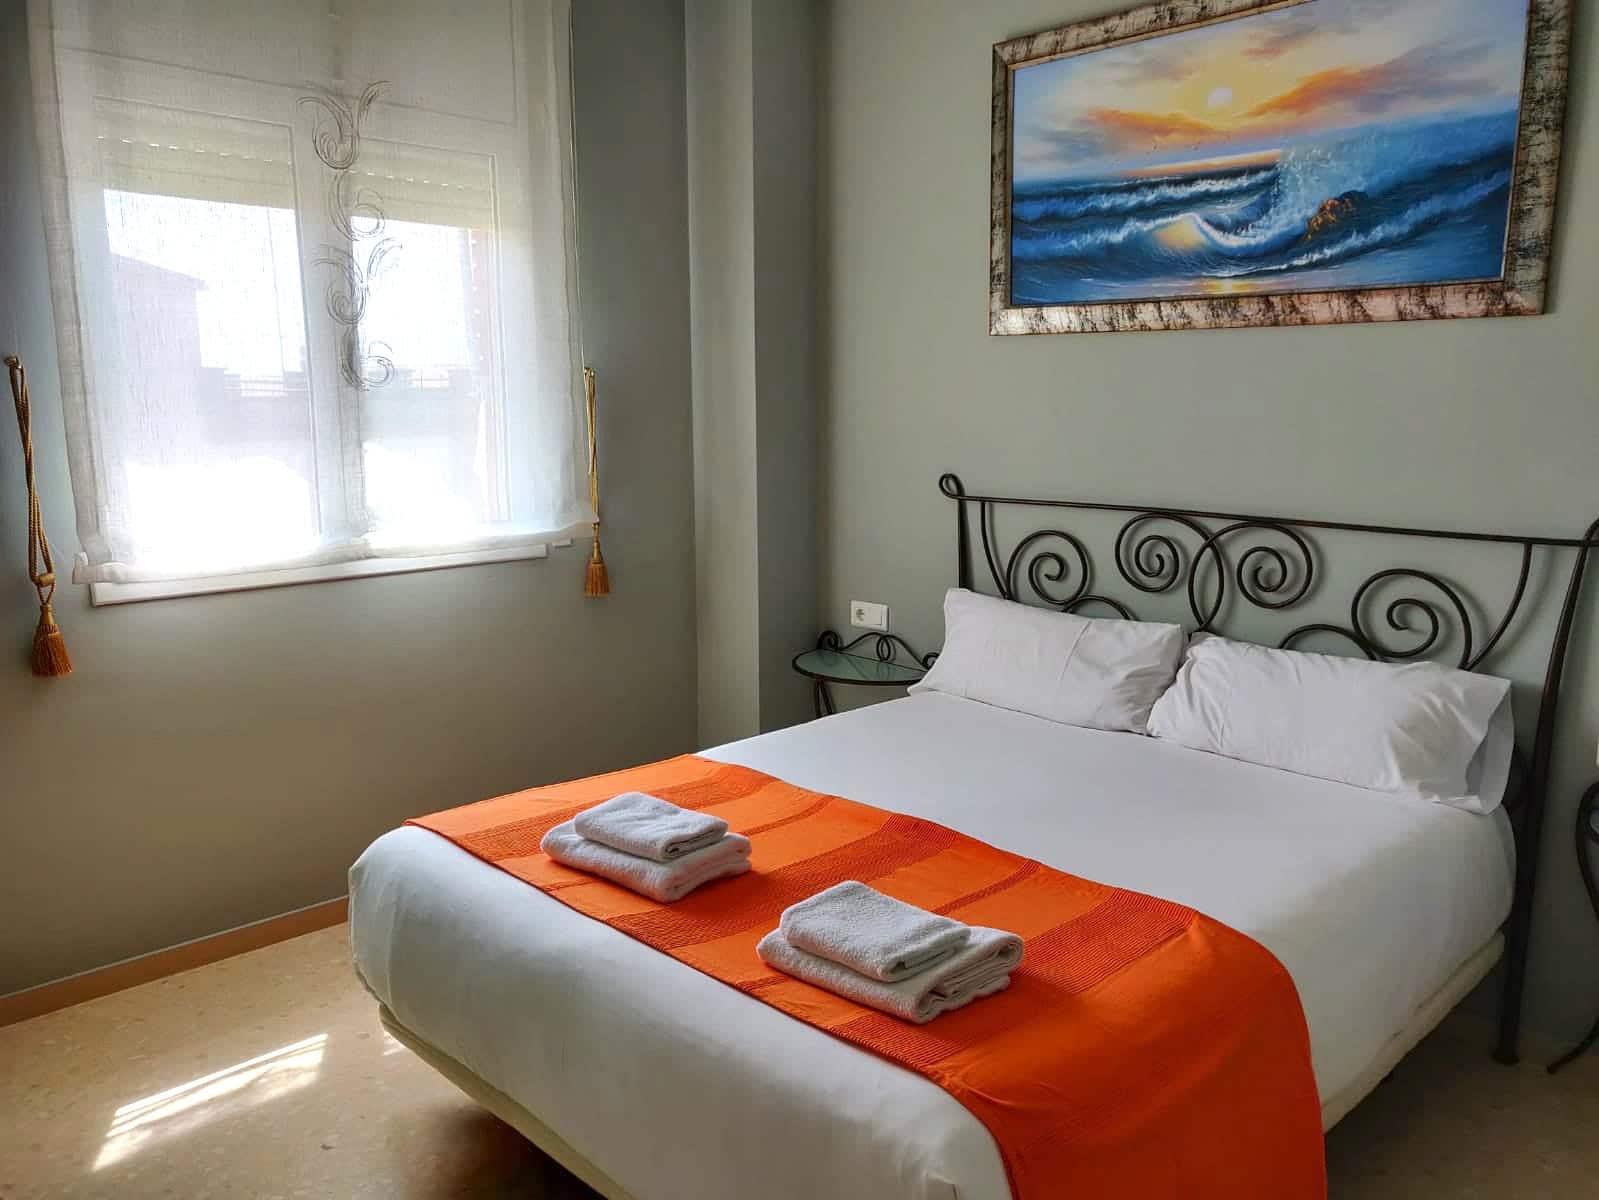 Apartament To Rent Santa Coloma de Cervello by MyRentalHost